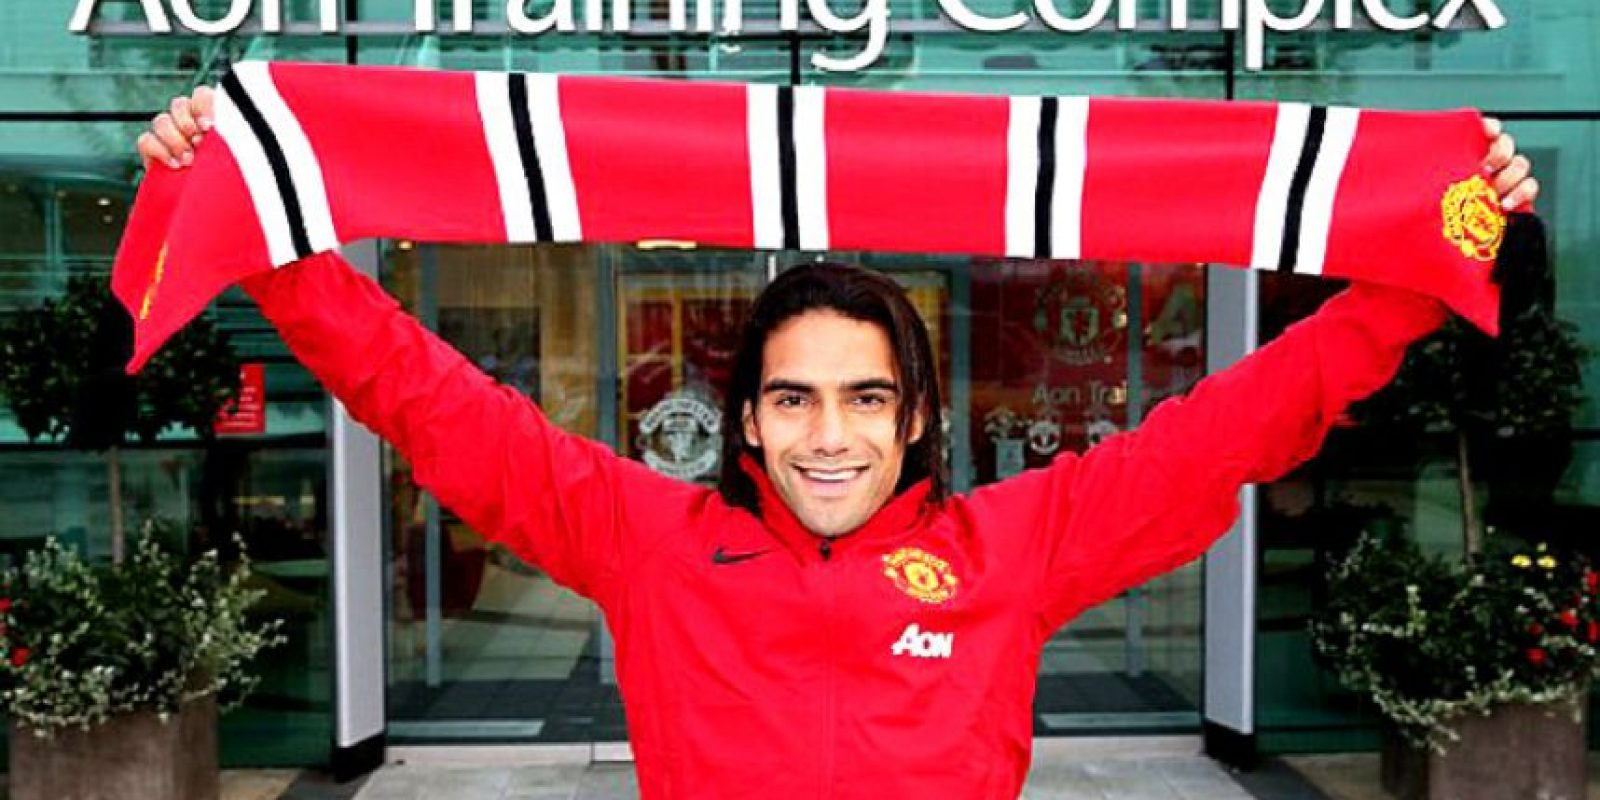 Foto:Cortesía Manchester United